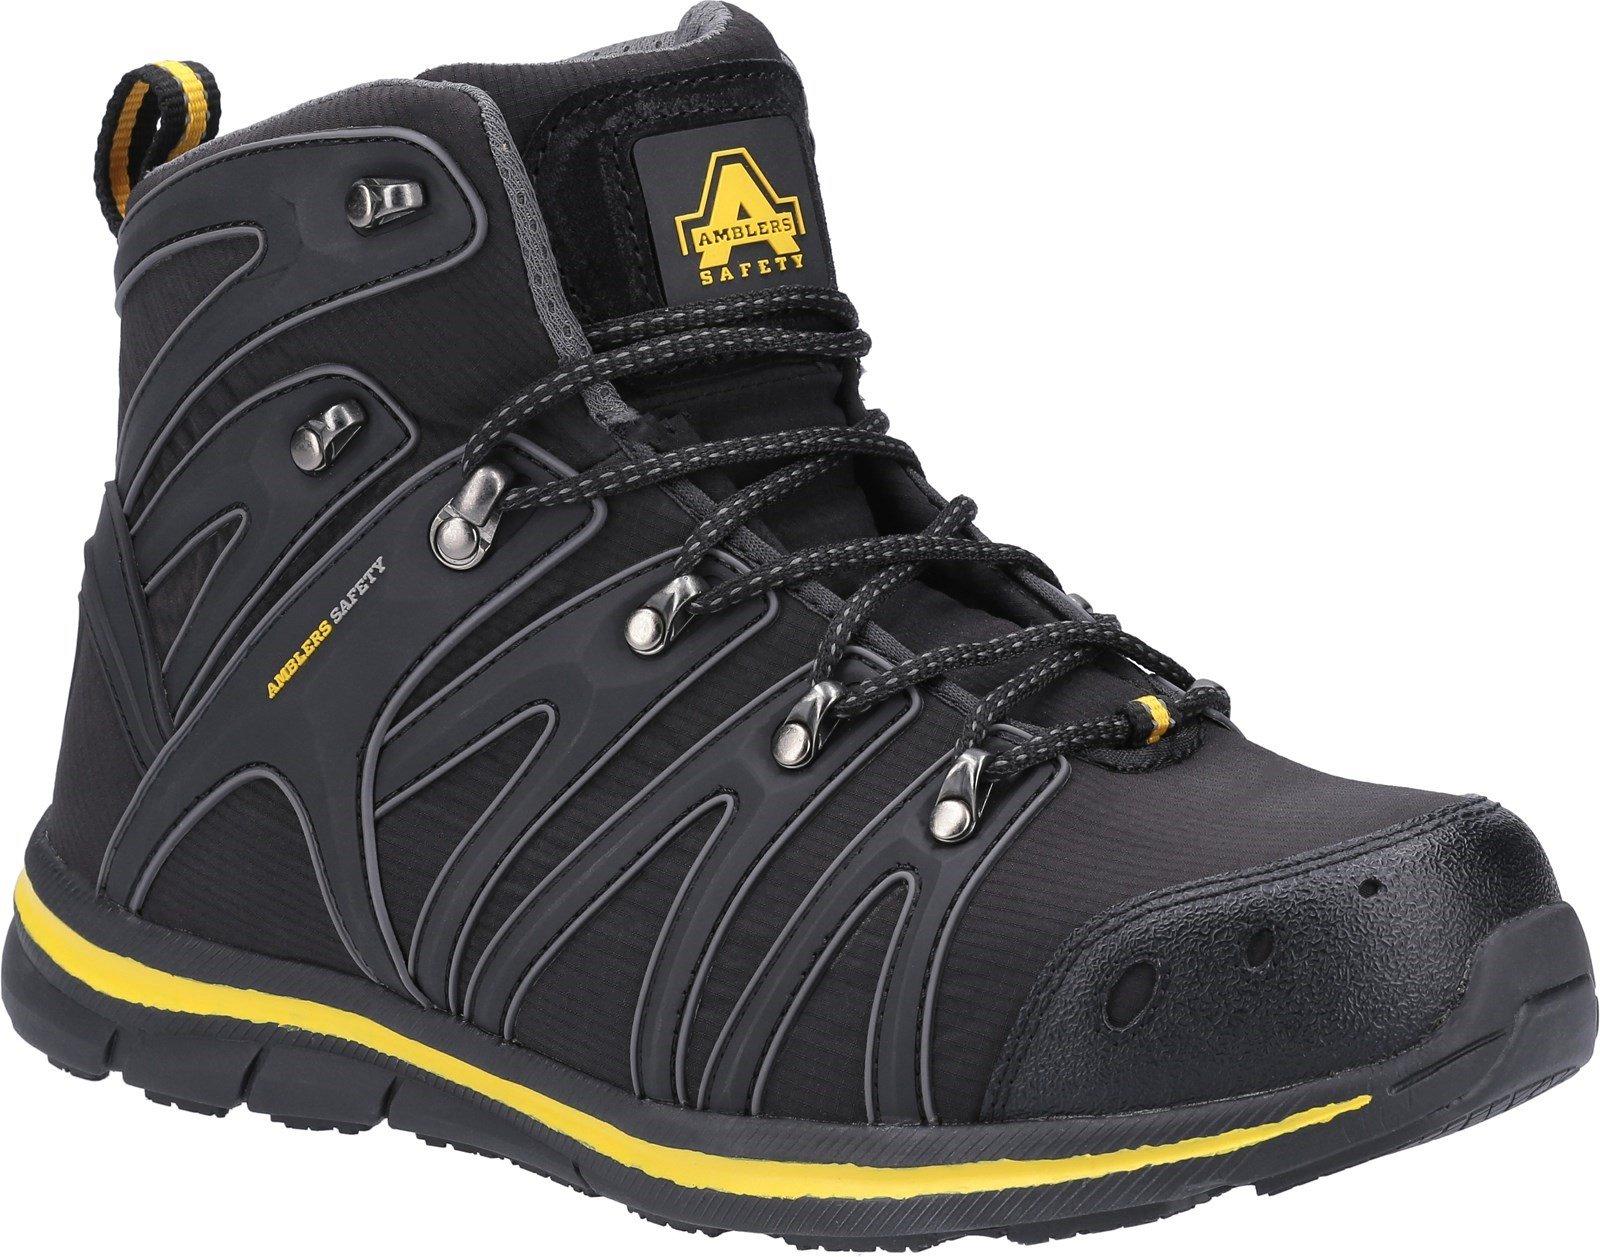 Amblers Safety Unisex Boot Black 31390 - Black 6